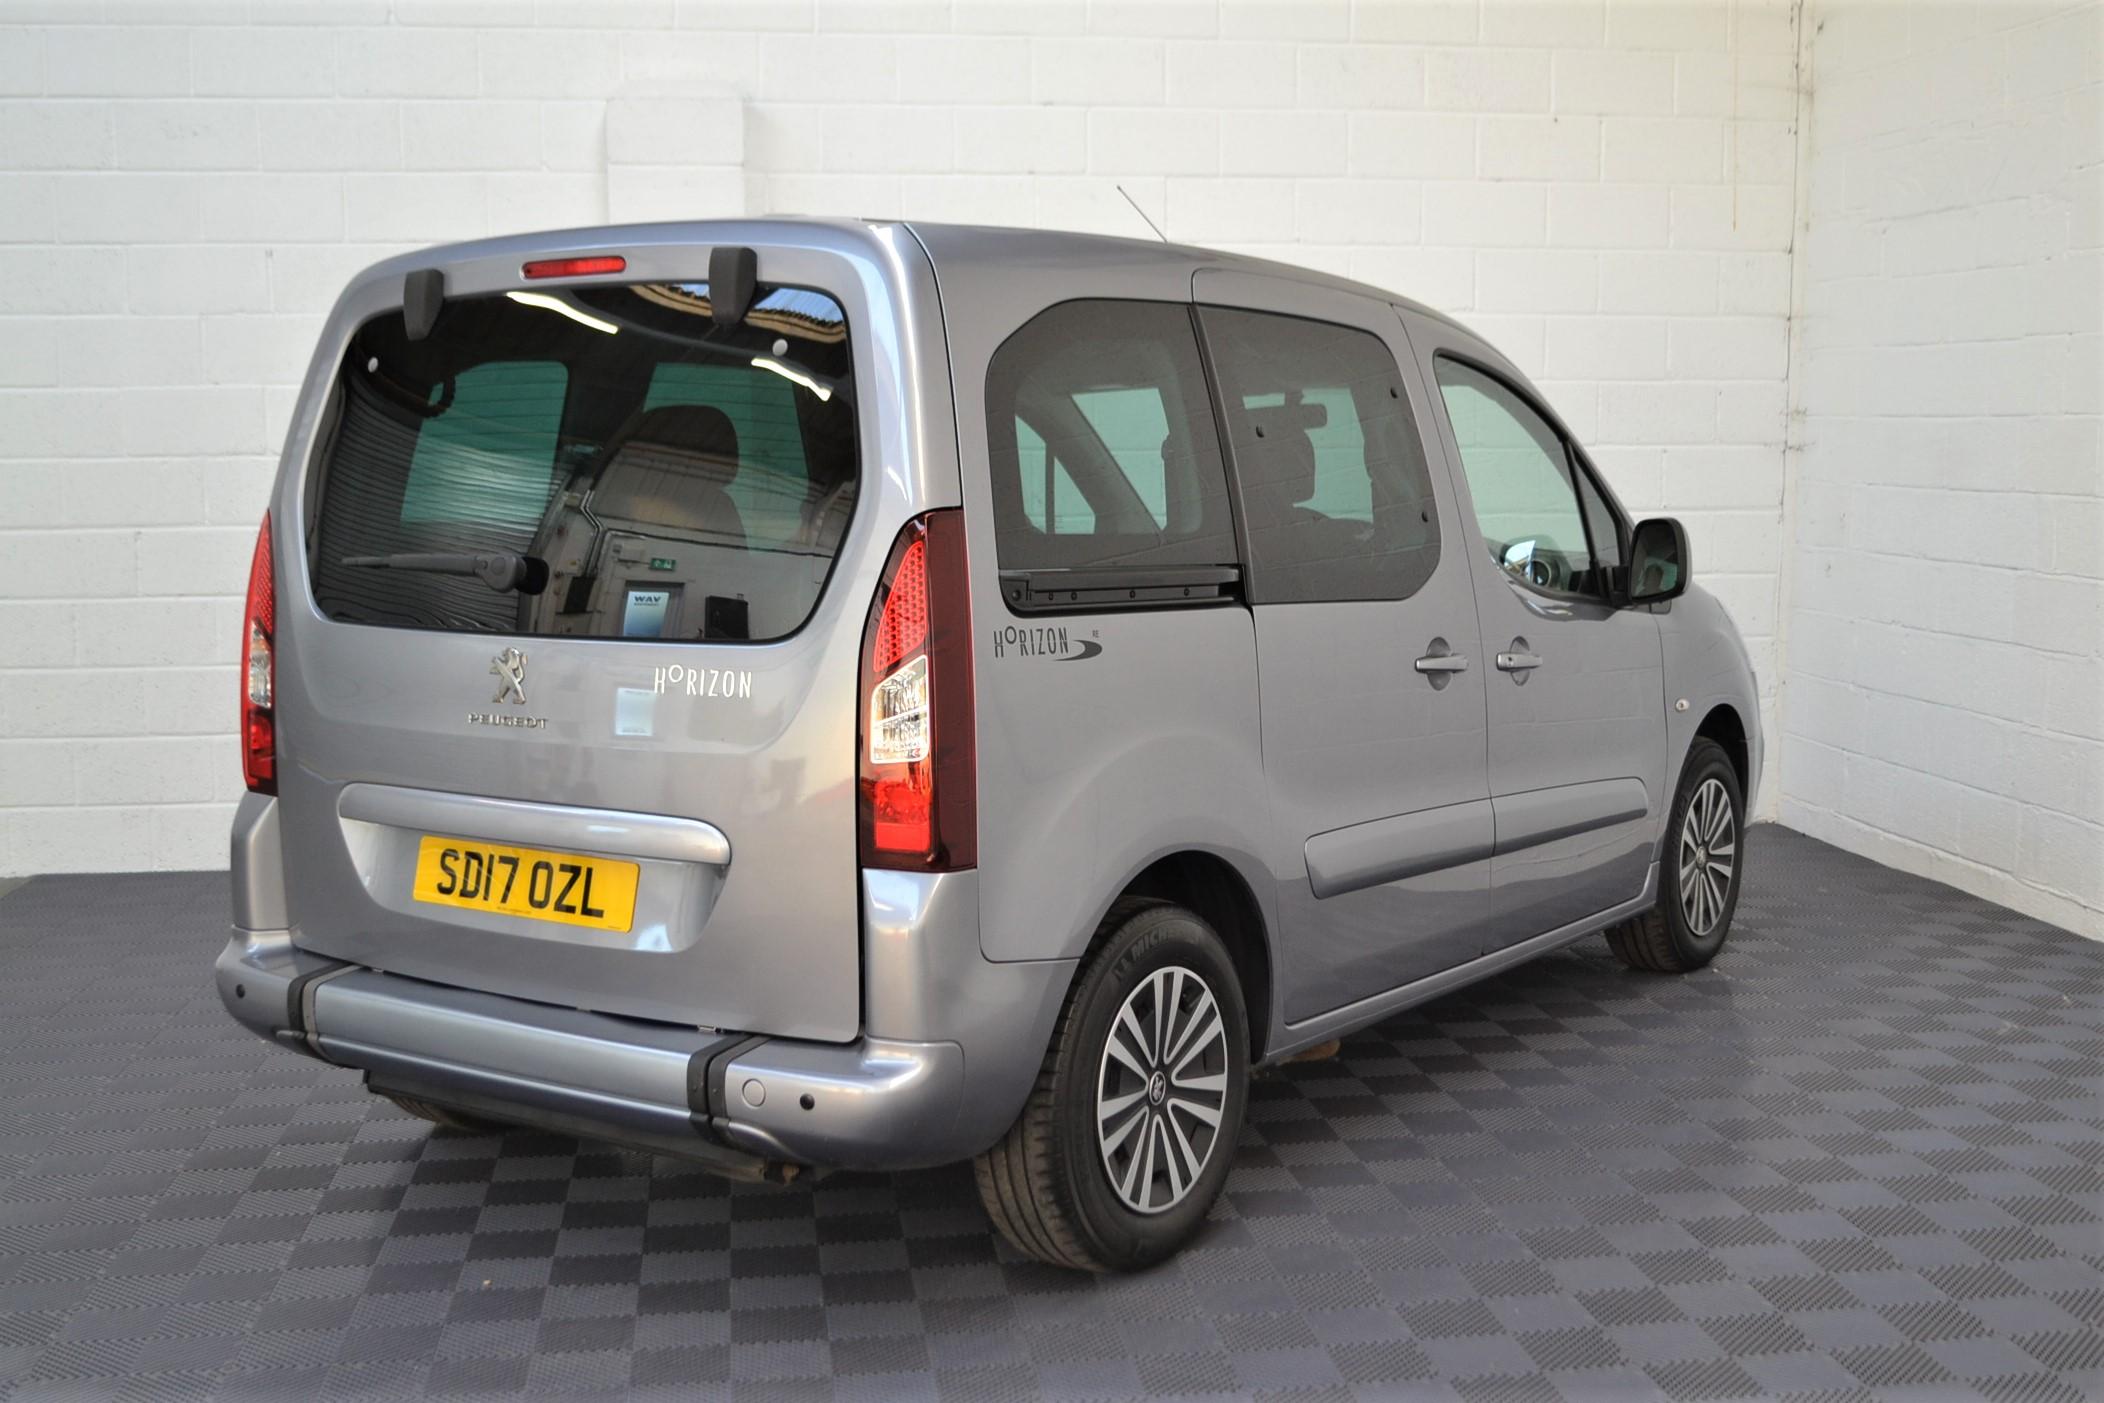 WAV Cars For Sale Bristol Wheelchair Accessible Vehicles Used For Sale Somerset Devon Dorset Bath Peugeot Partner SD17 OZL 6